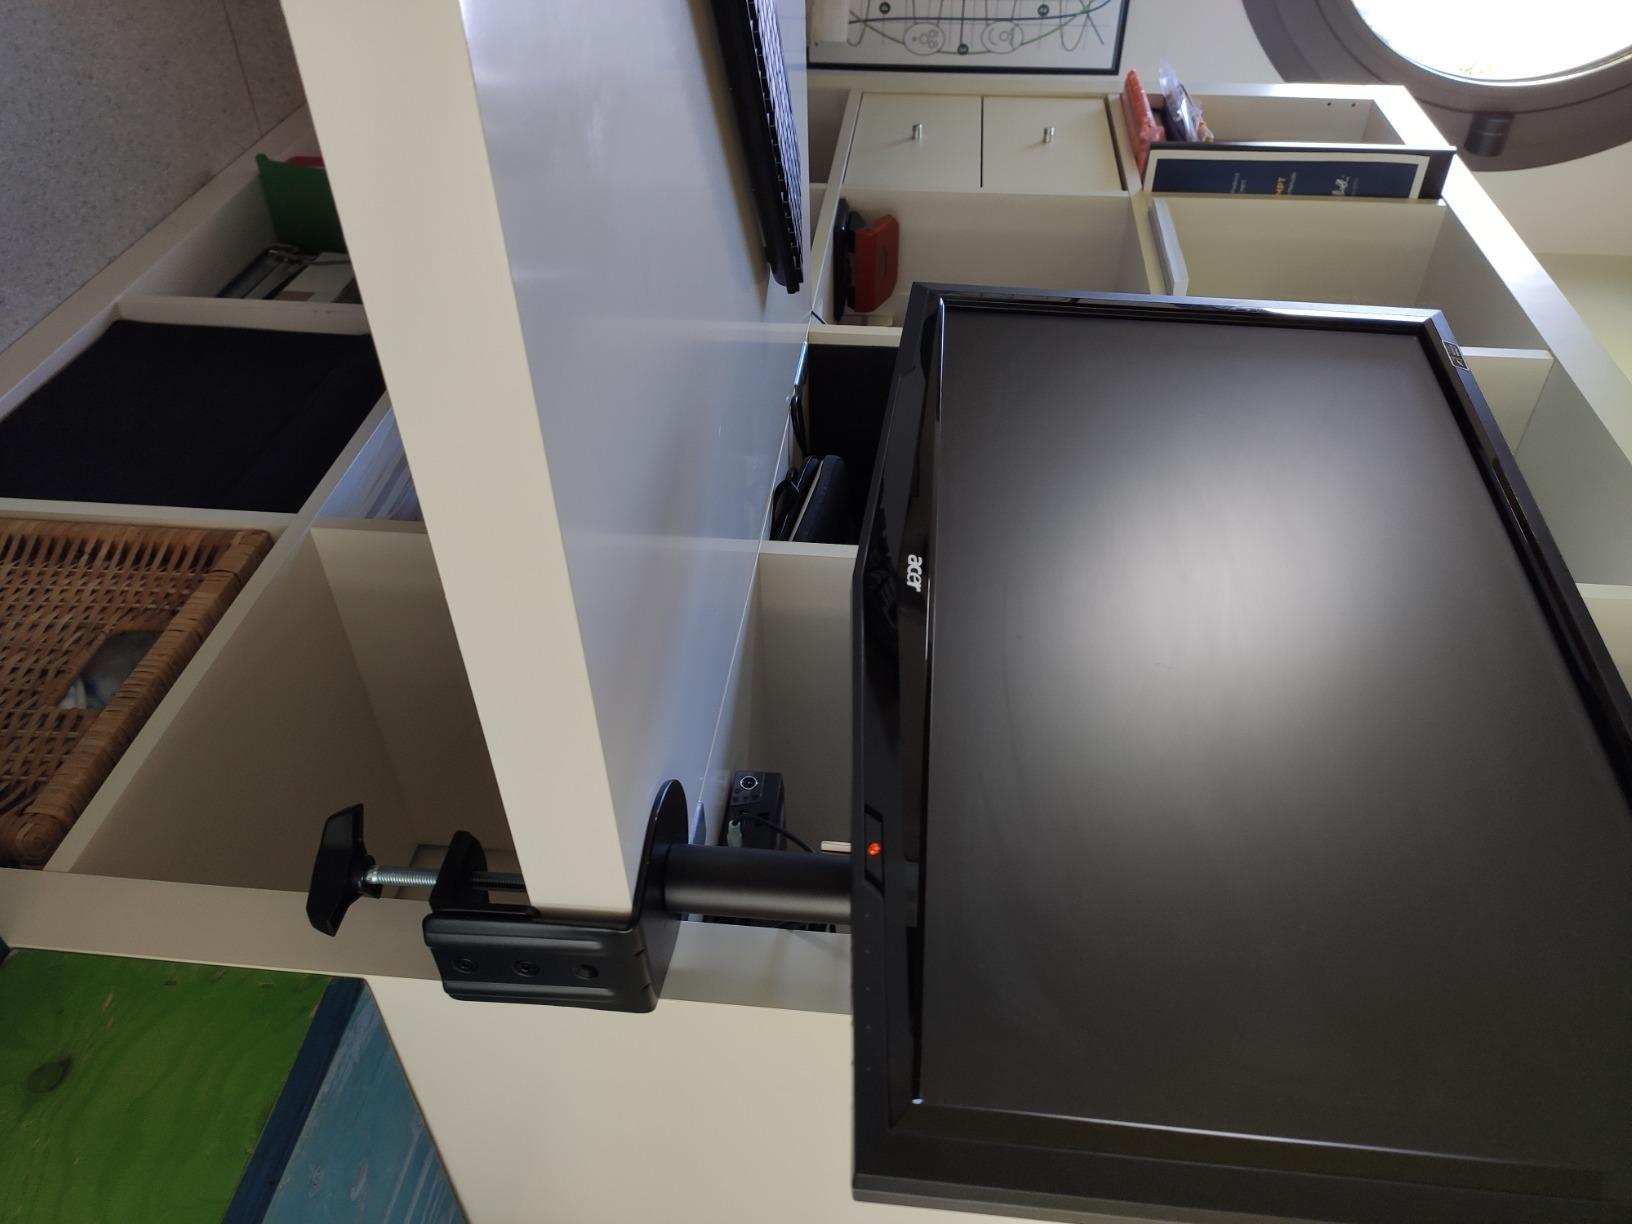 Canalina Per Fili Tv 147.99 - putorsen® pc dual monitor arm-heavy duty aluminum